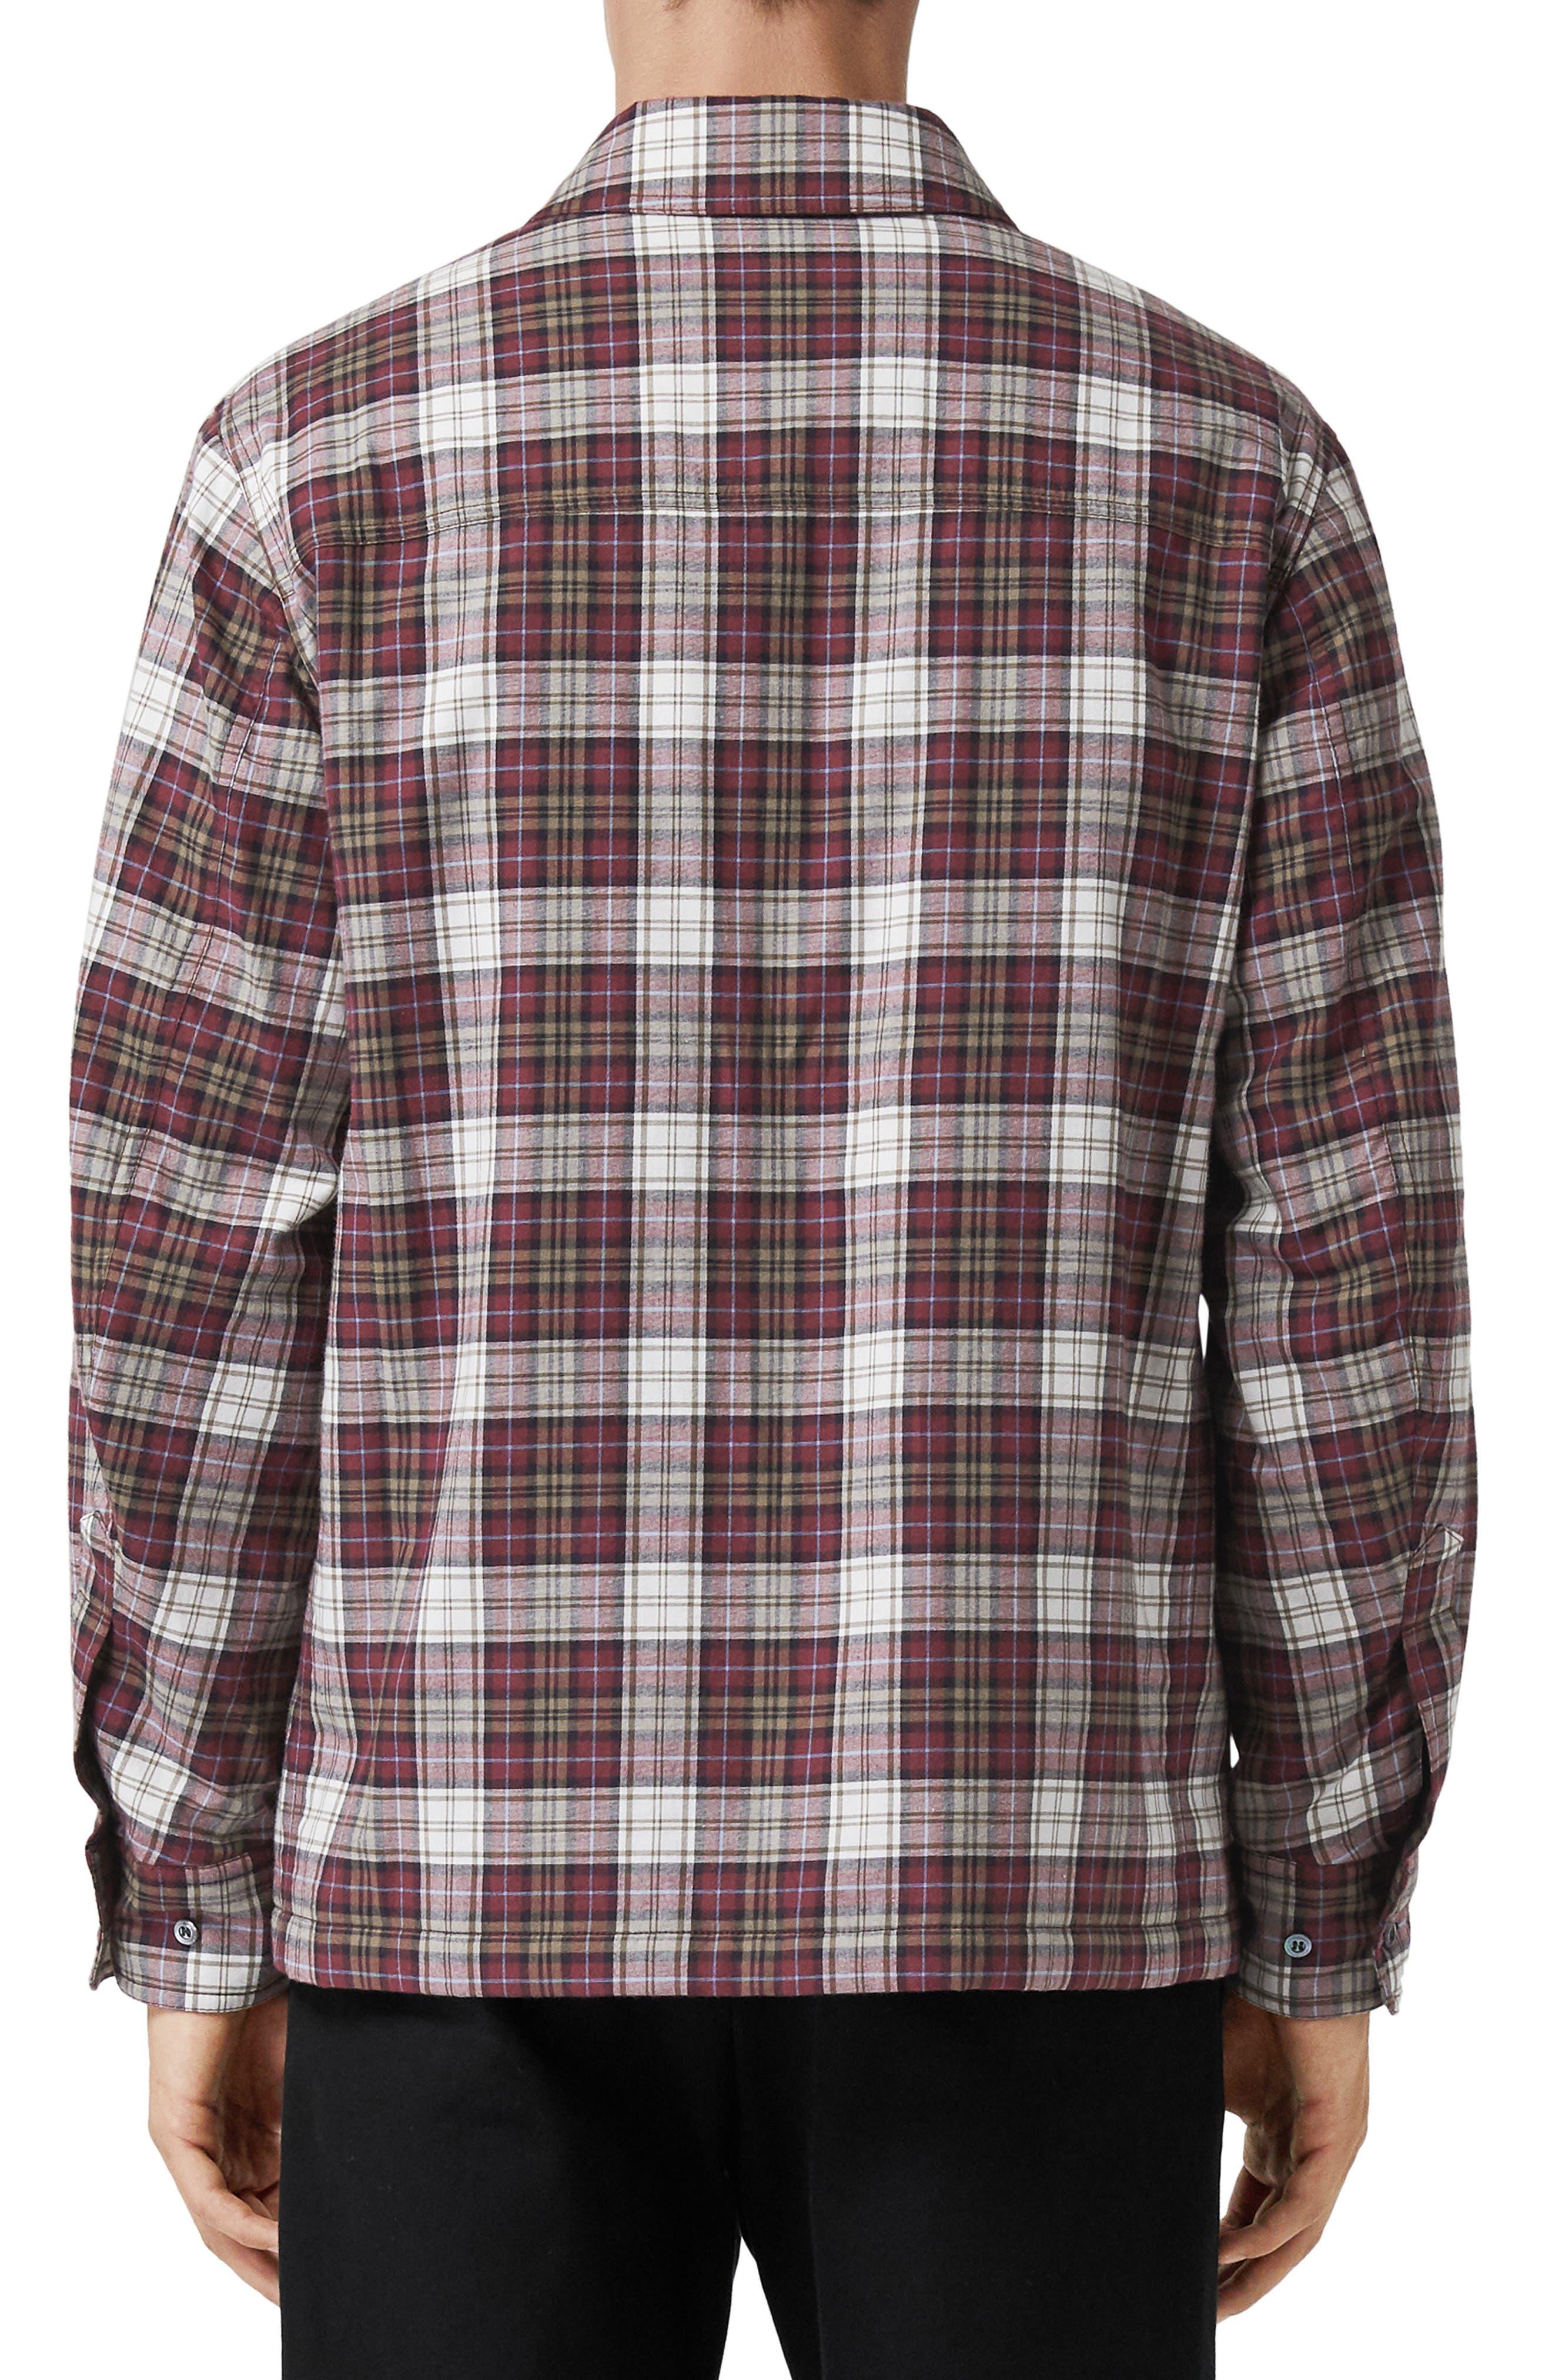 Barlow Plaid Flannel Shirt,                             Alternate thumbnail 3, color,                             600